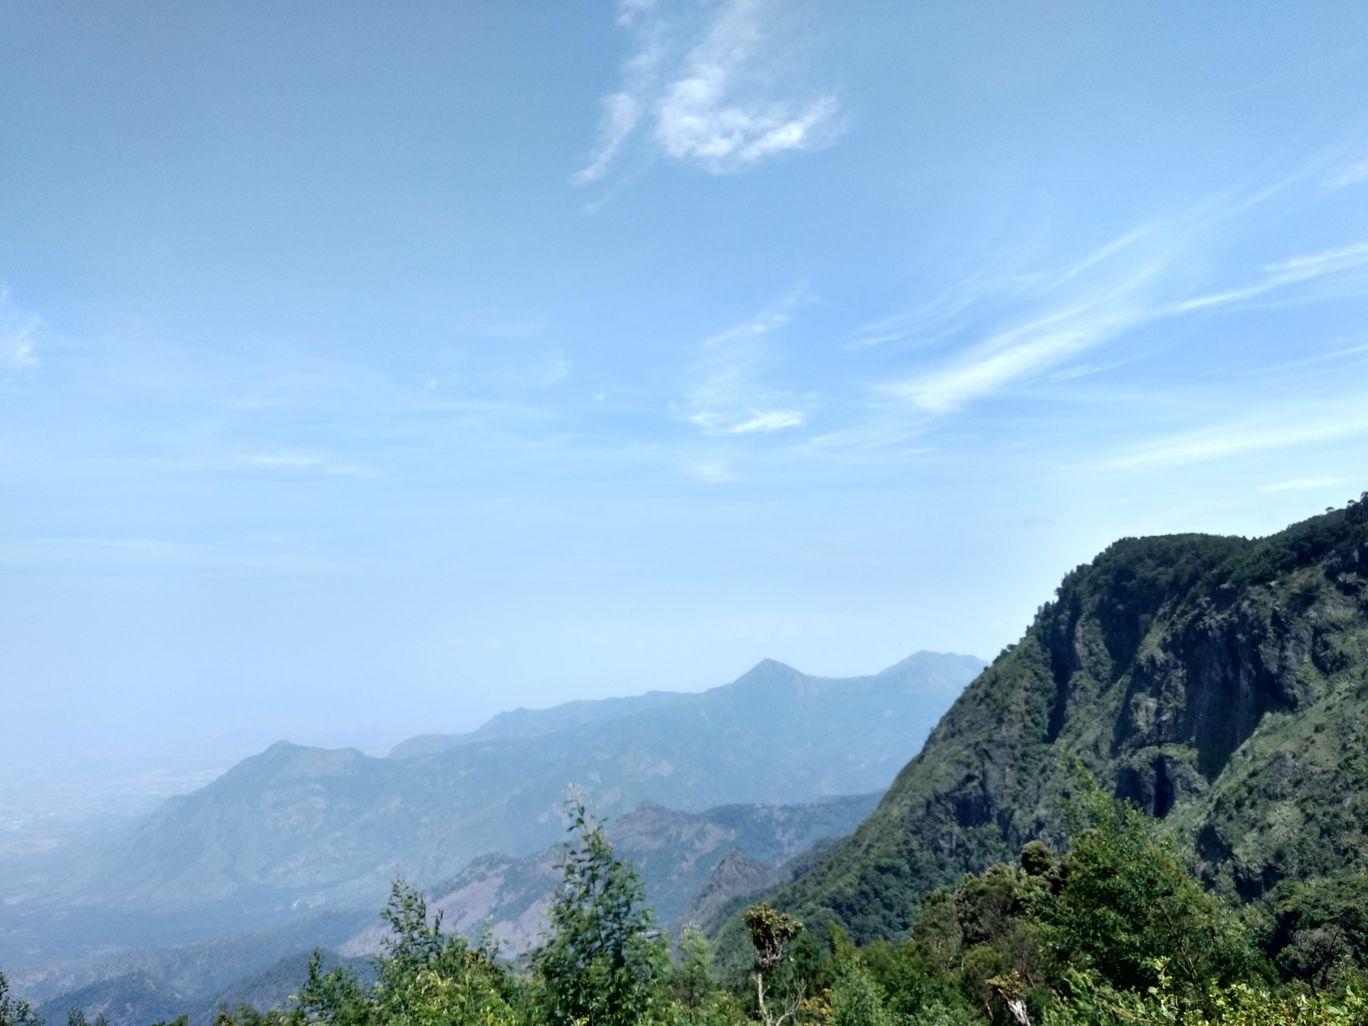 Photo of Kodaikanal By Sanjeev K Singh